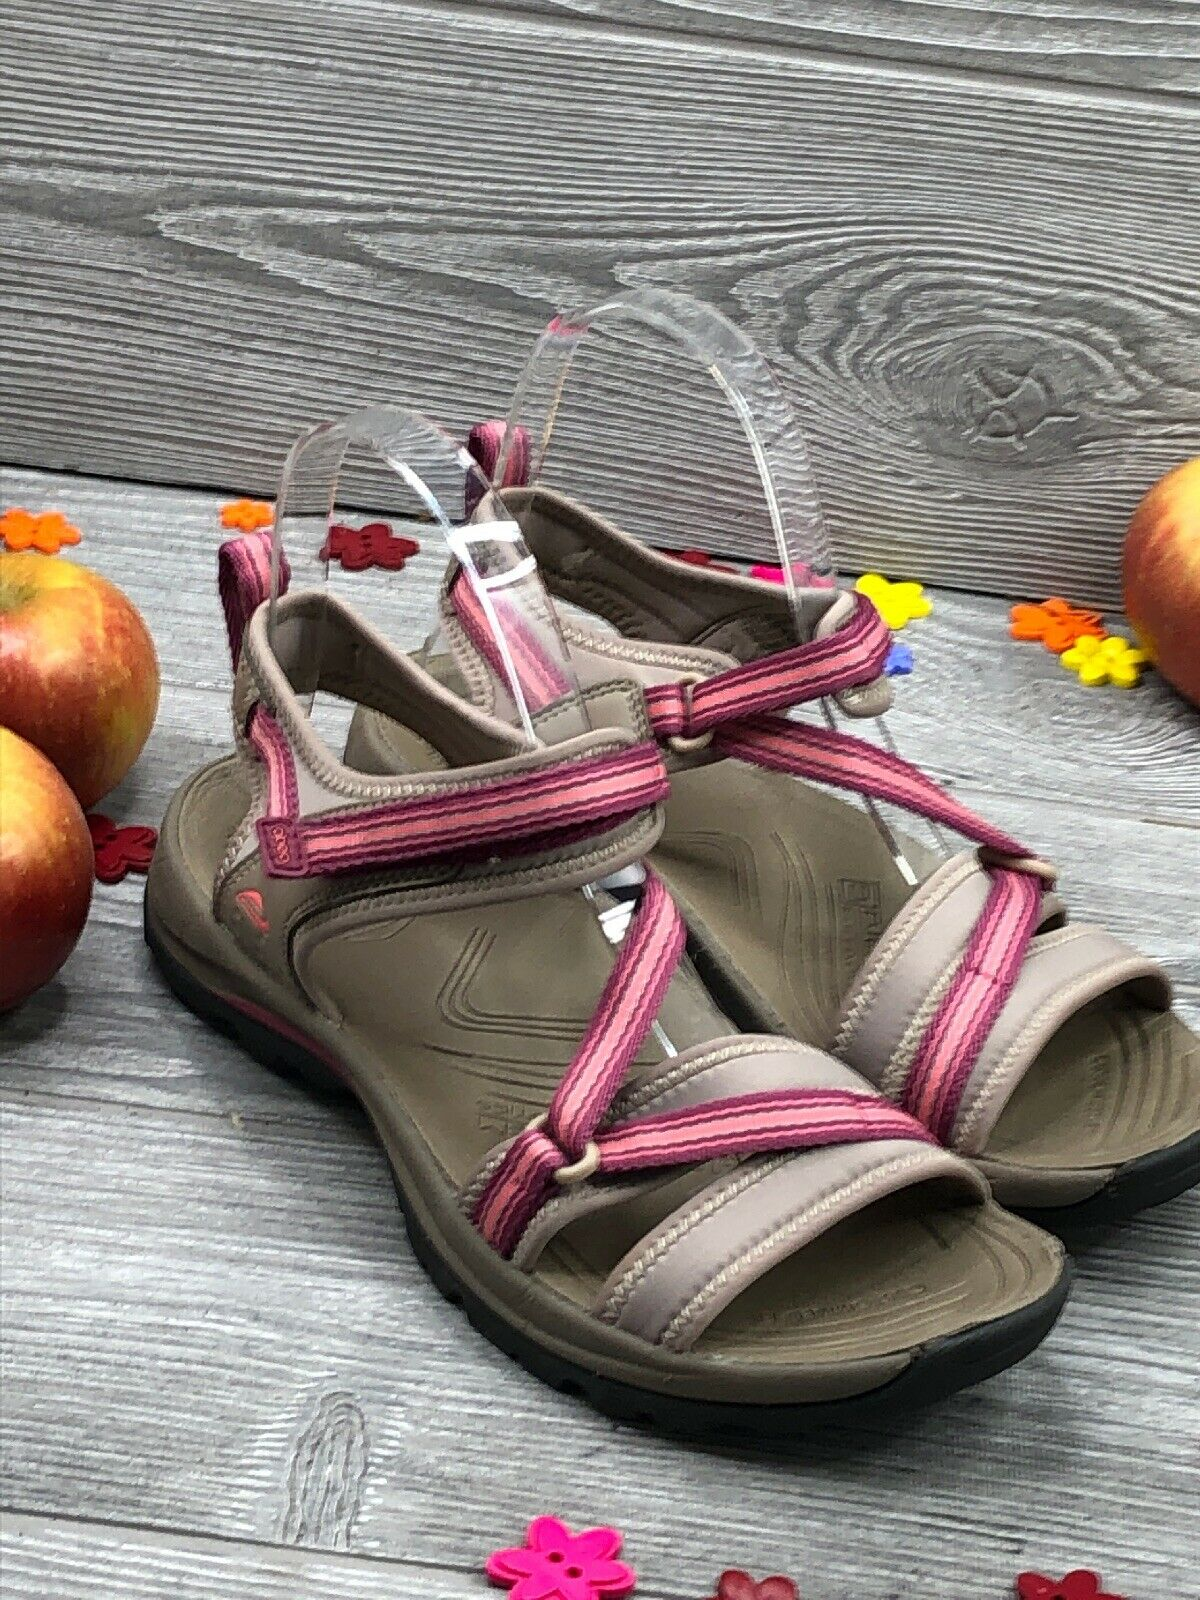 Abeo Women's Dunes Sandals Beige Pink Size US 7 Neutral Footbed ( 2200 )